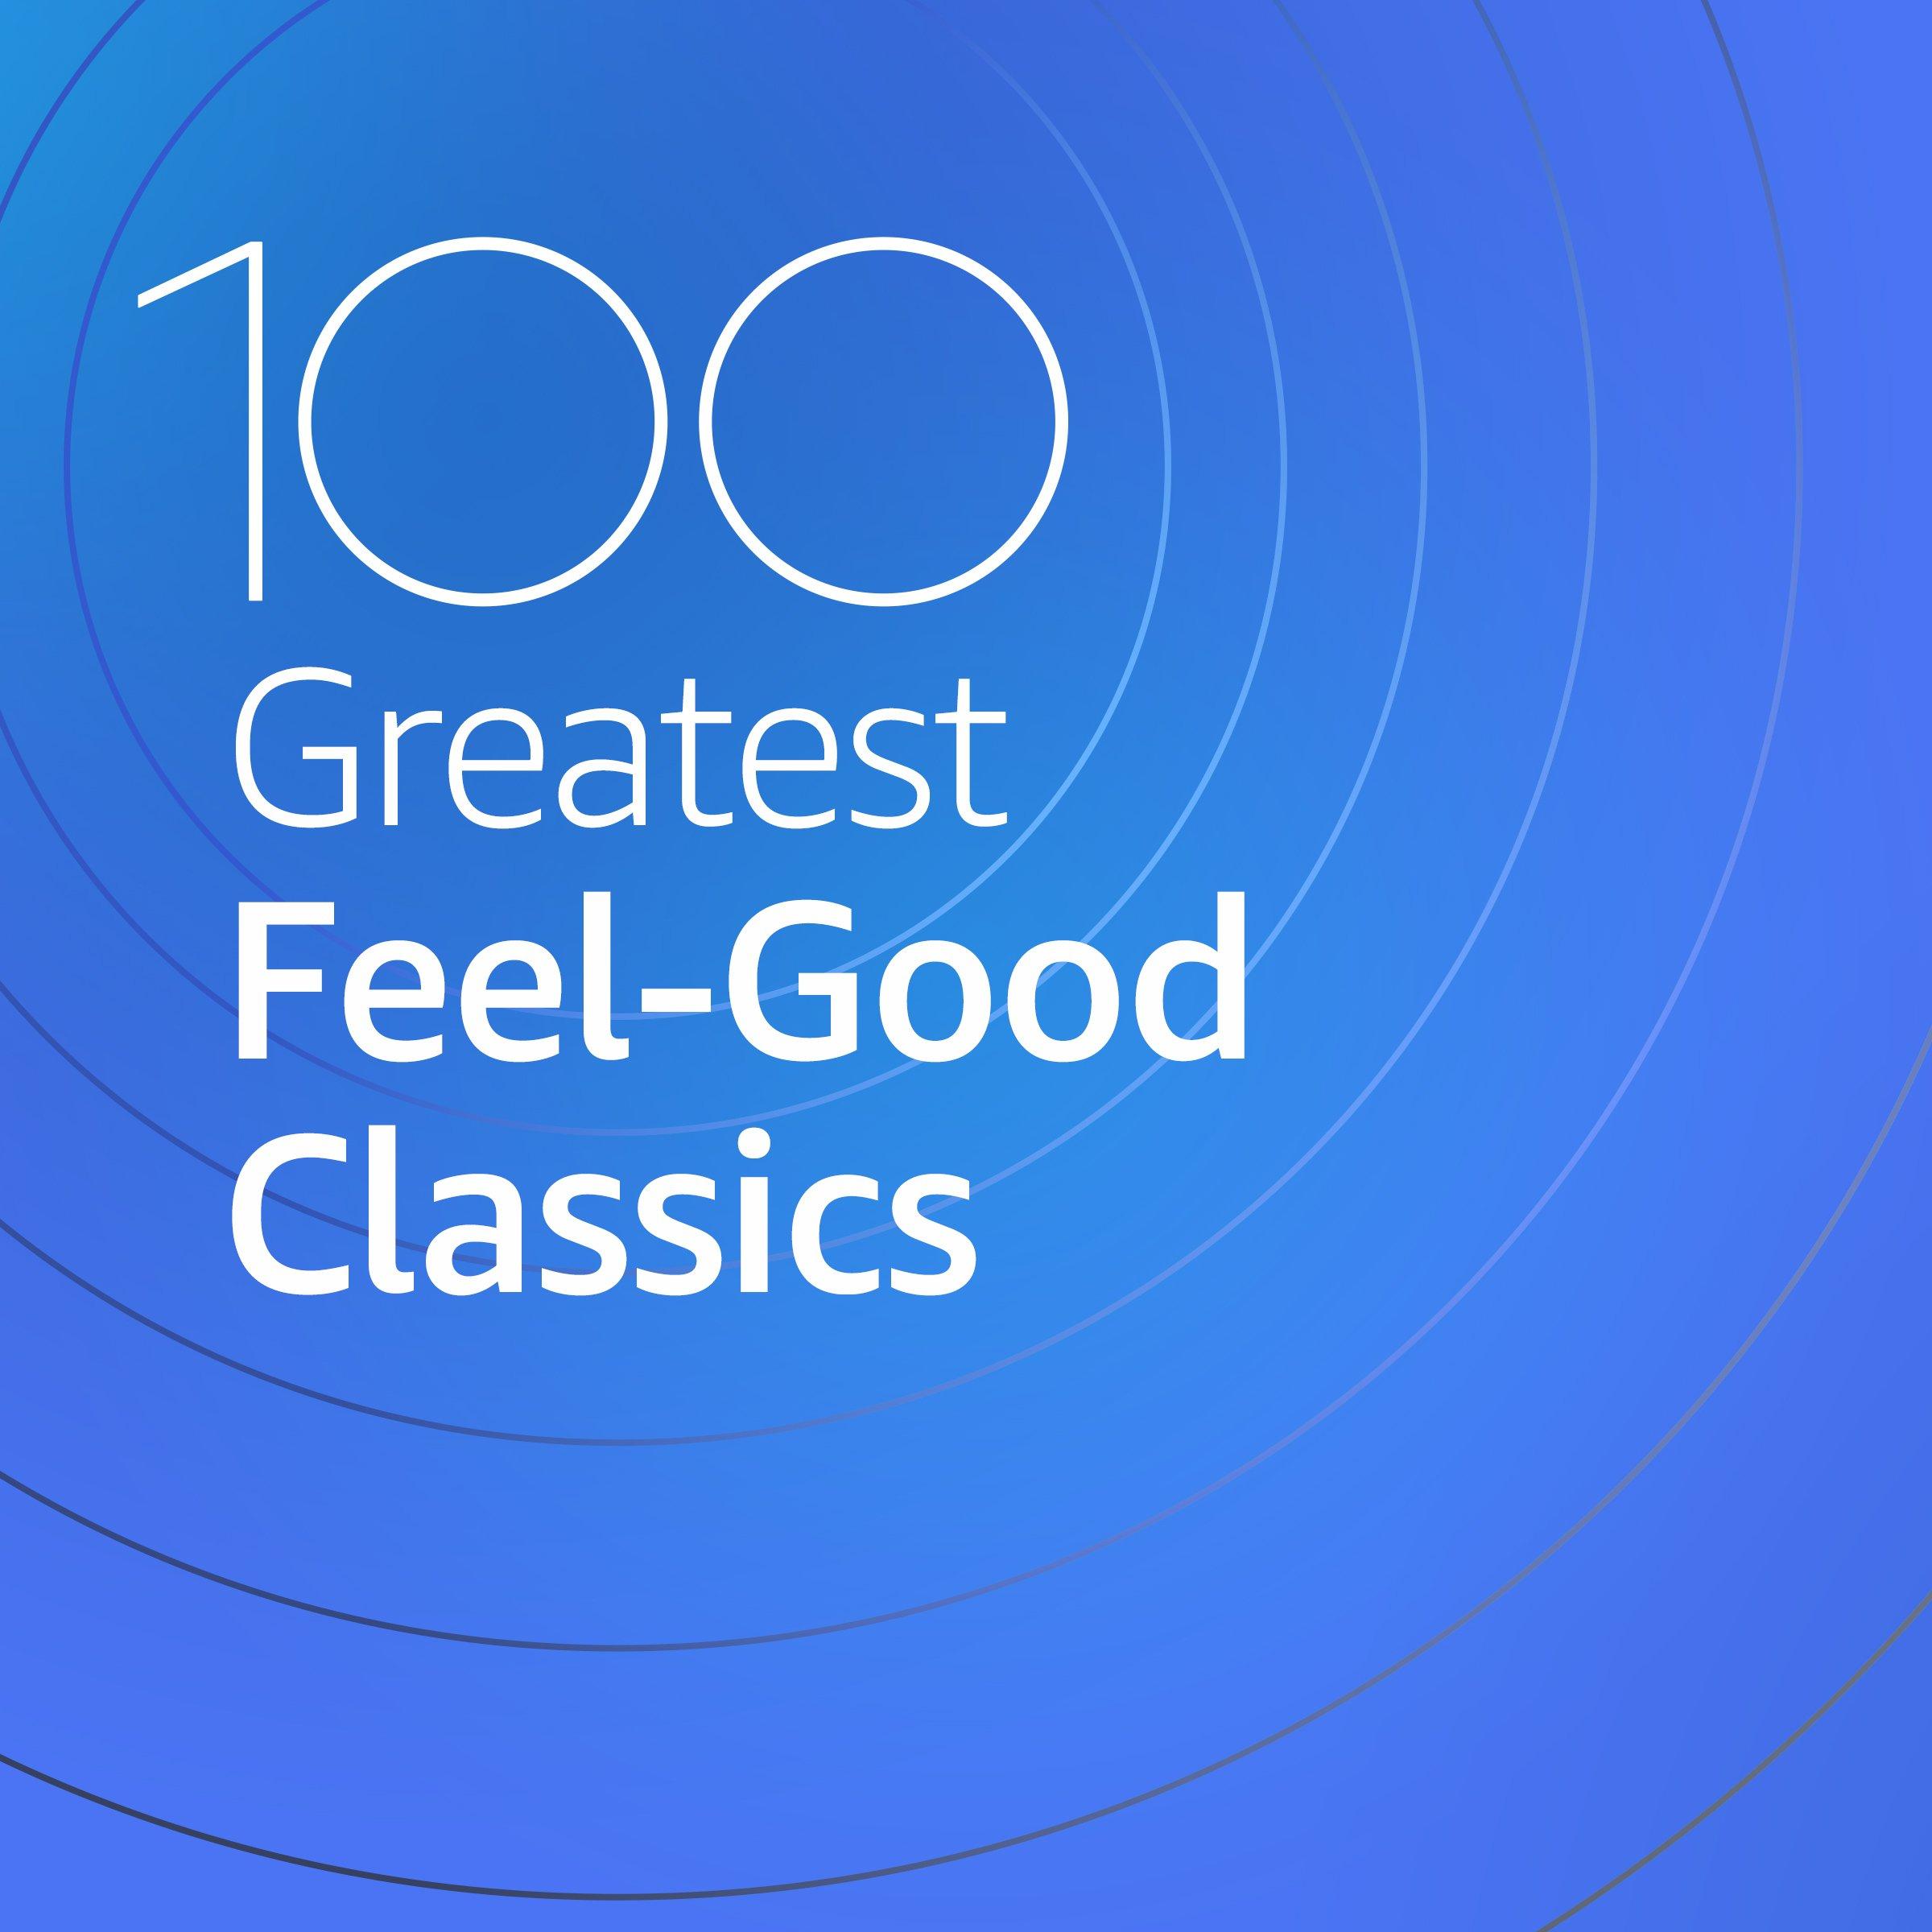 100 Greatest Feel-Good Classics